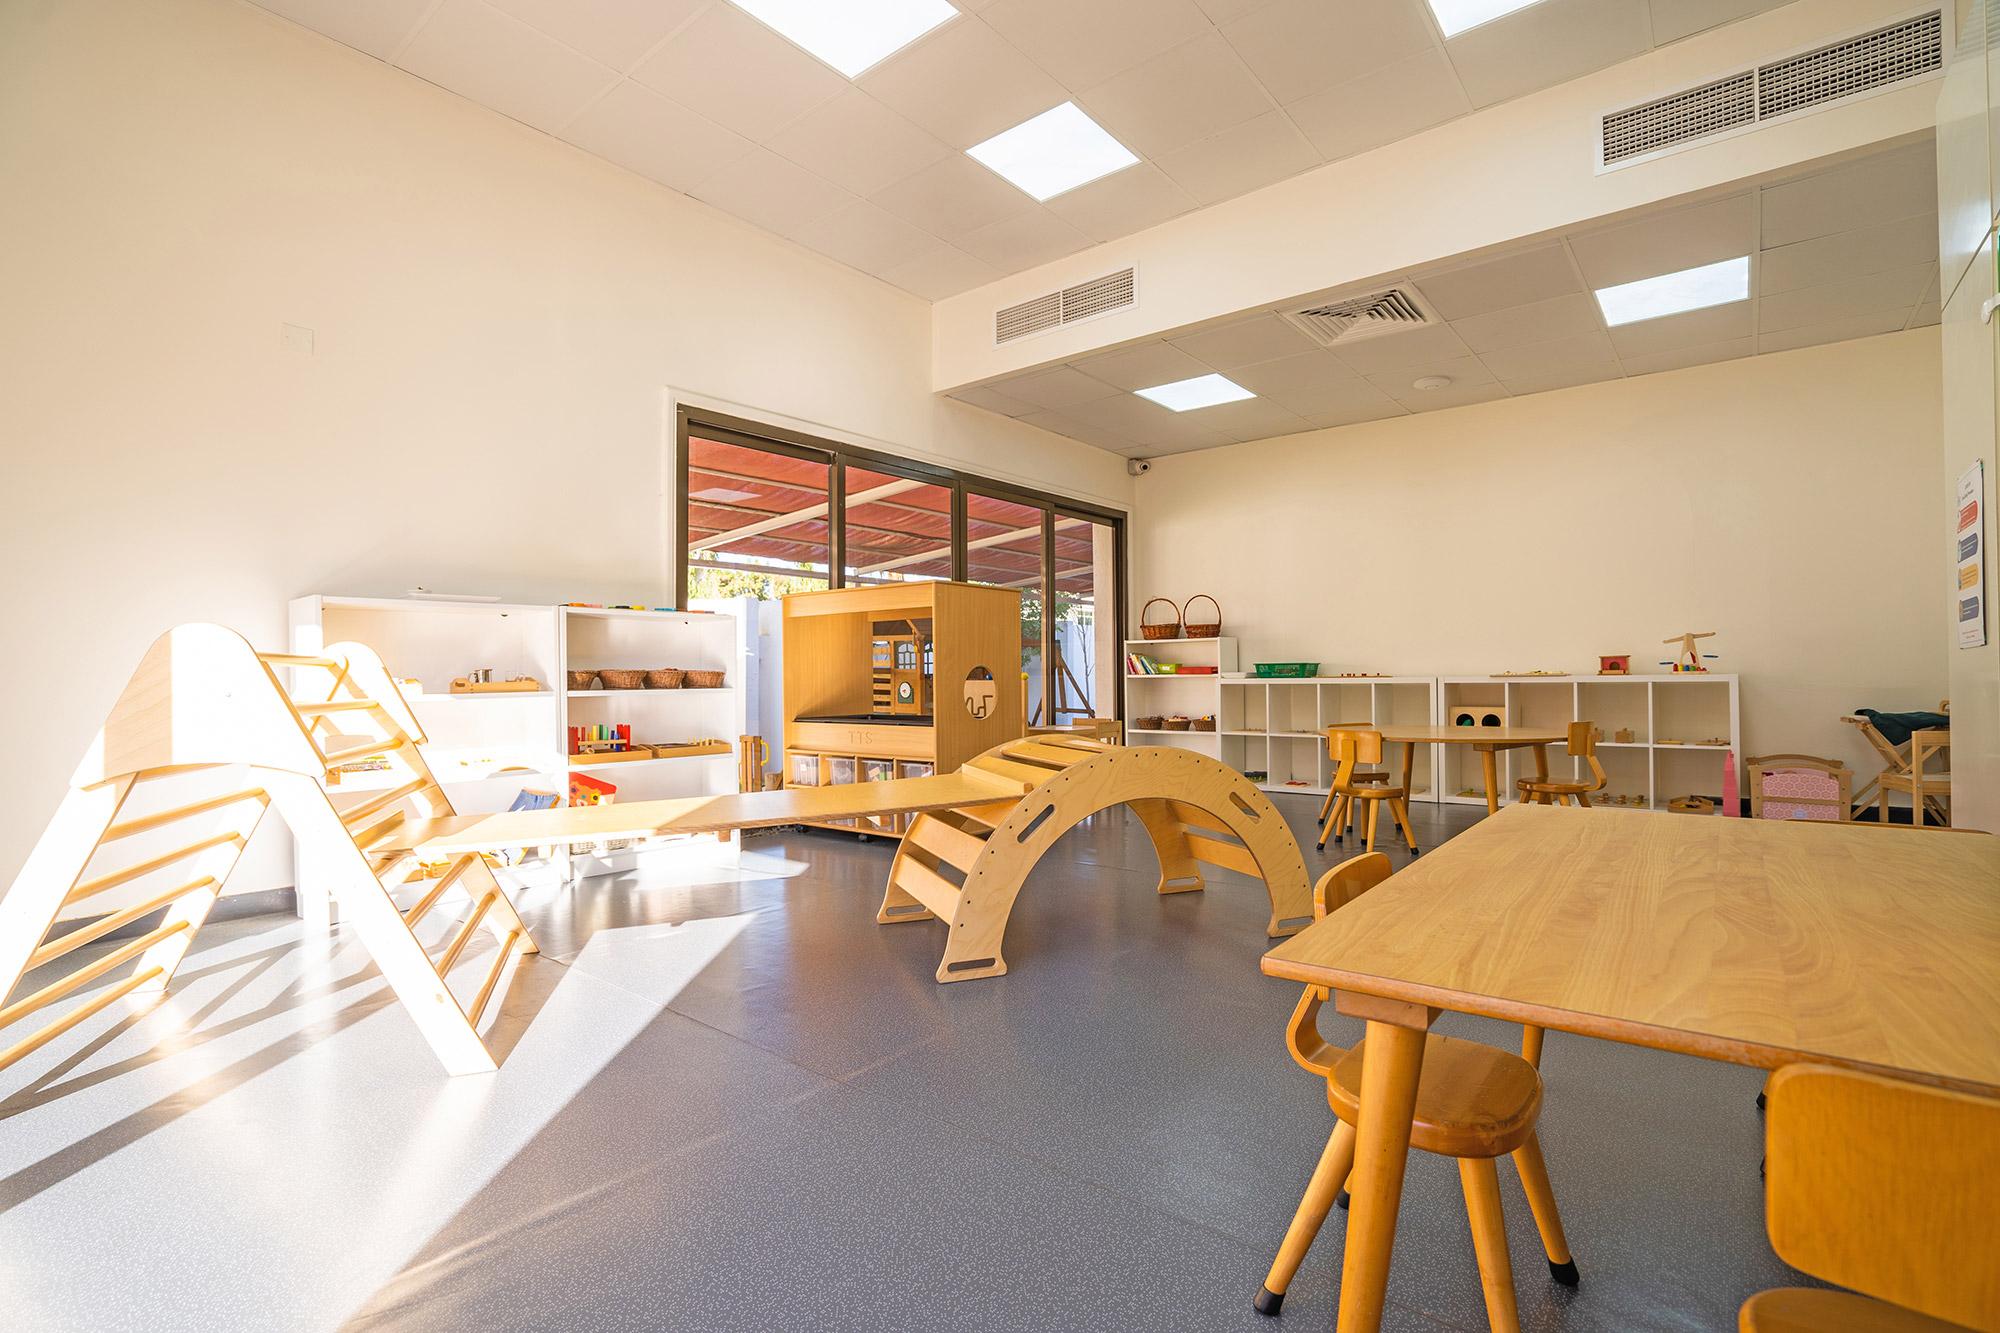 Redwood-Garhoud-Casa-1-